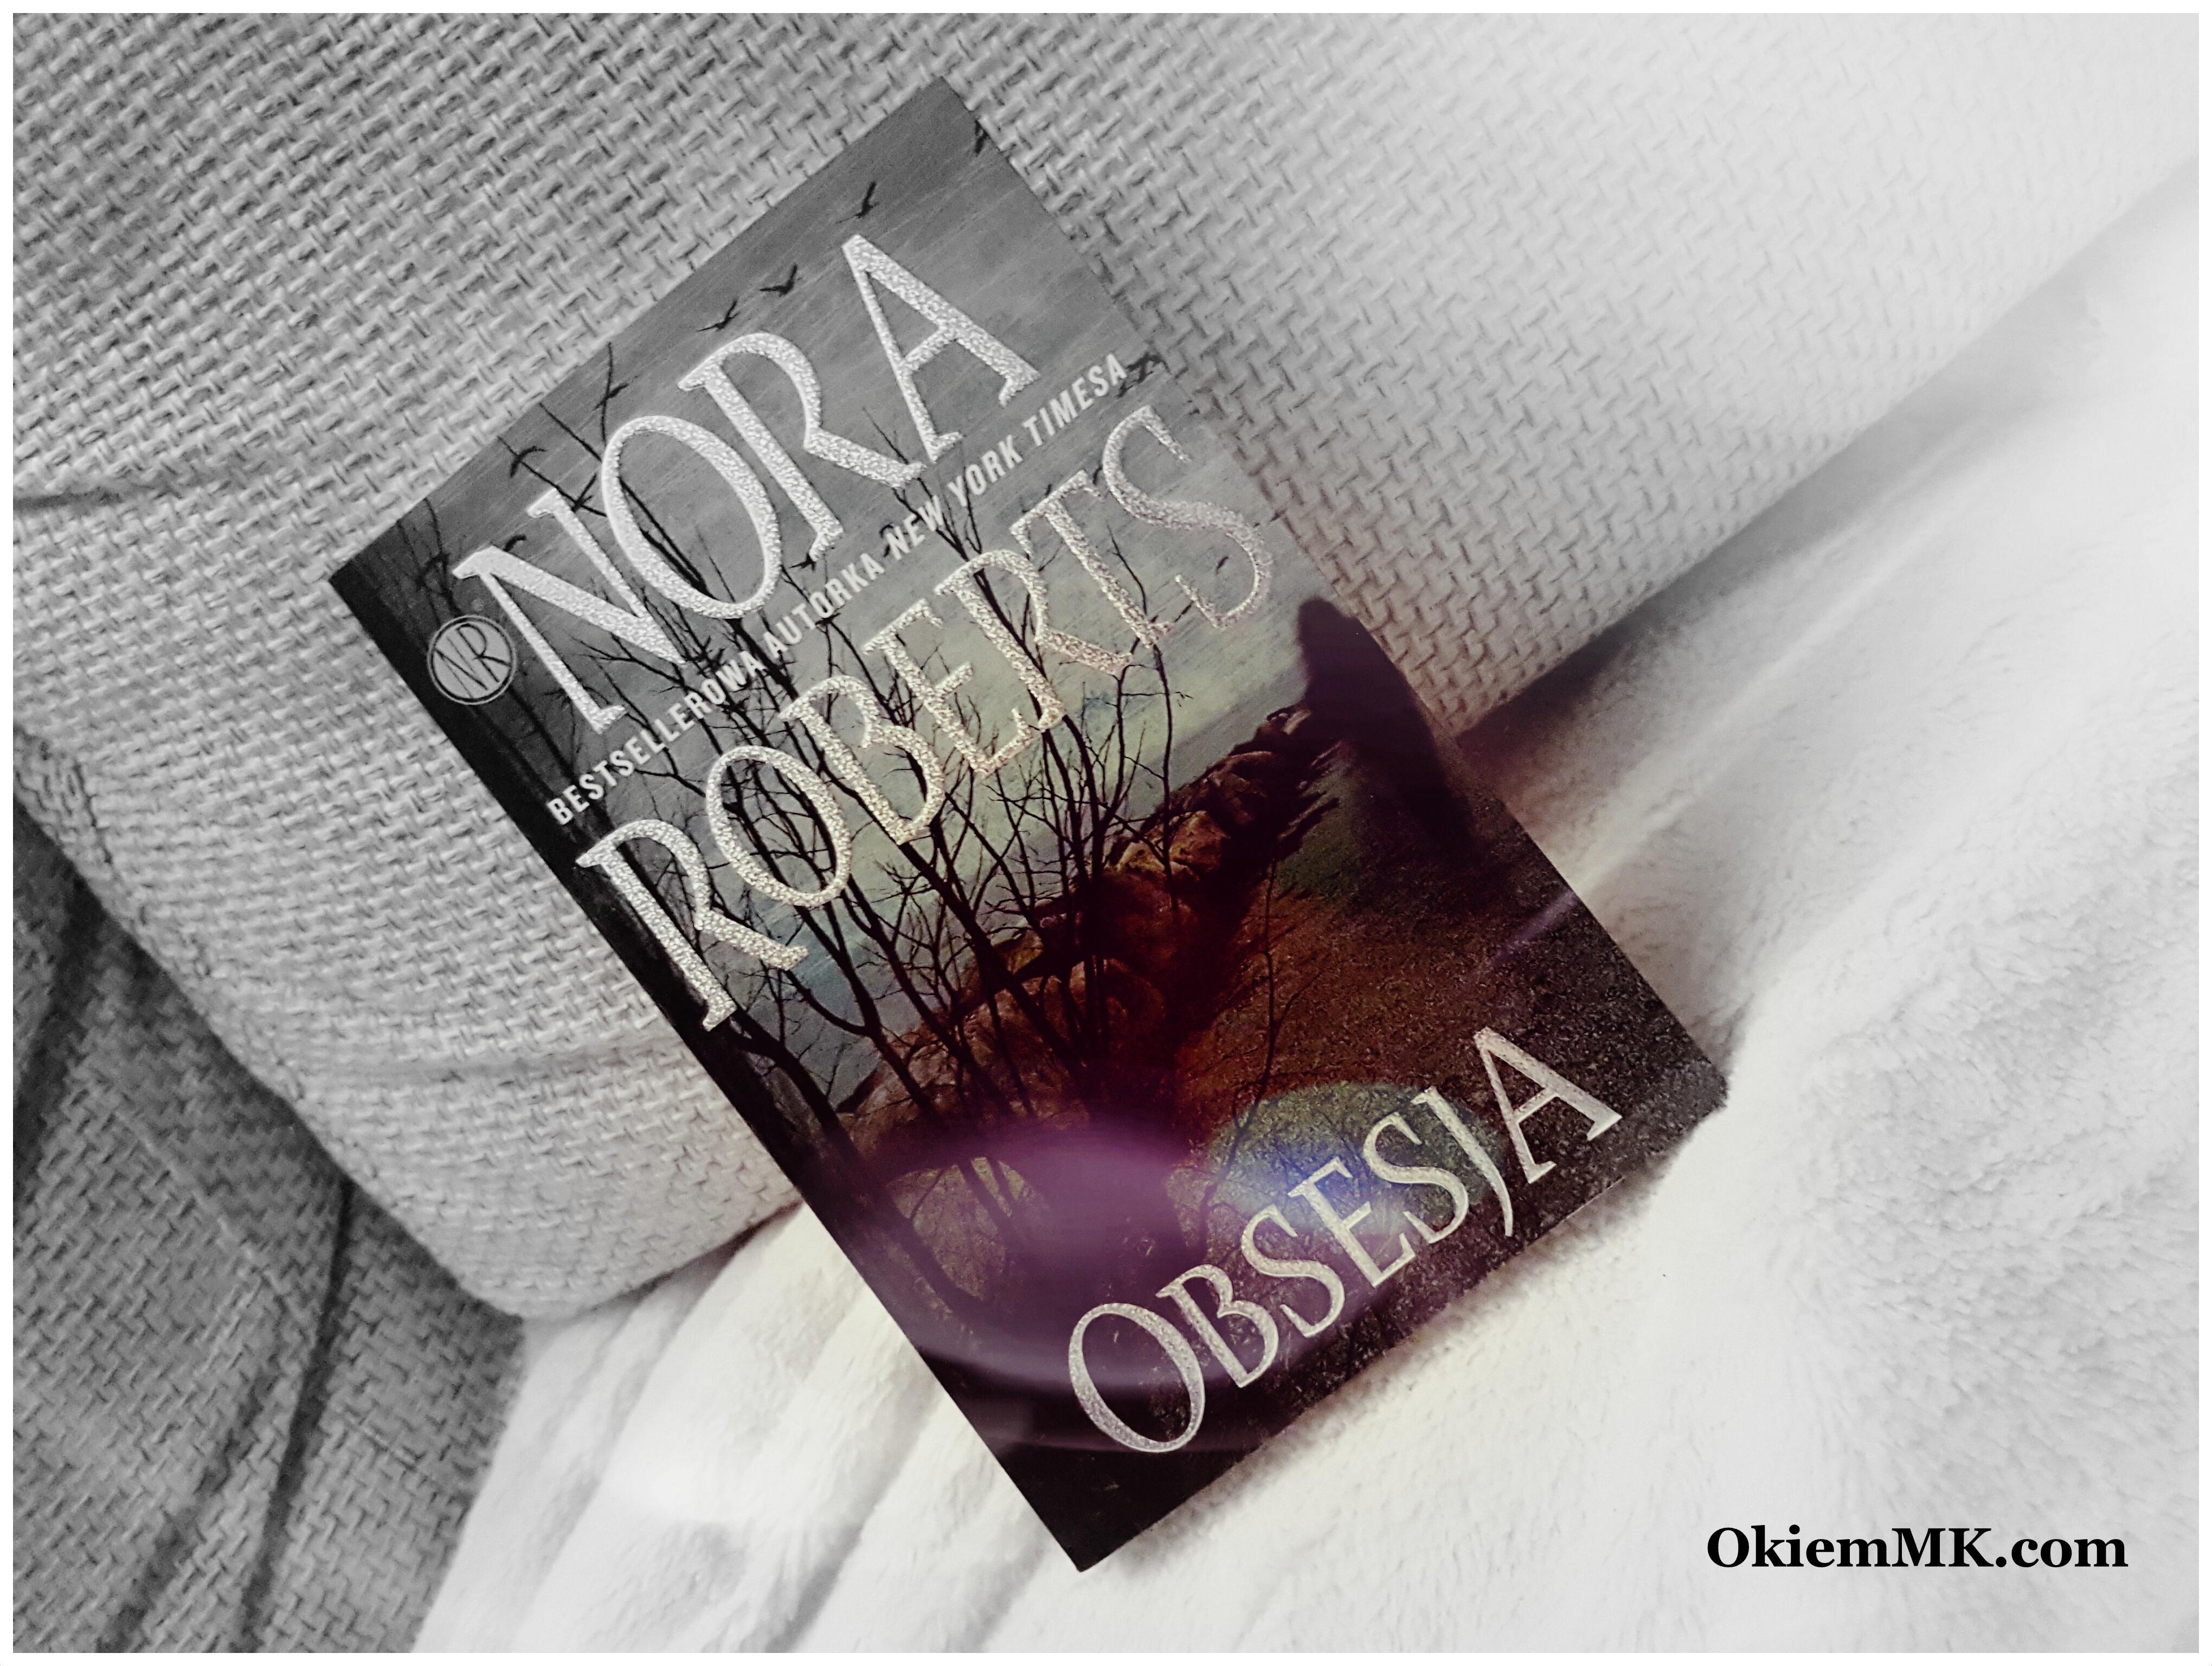 obsesja-nora-roberts-opiniarecenzja